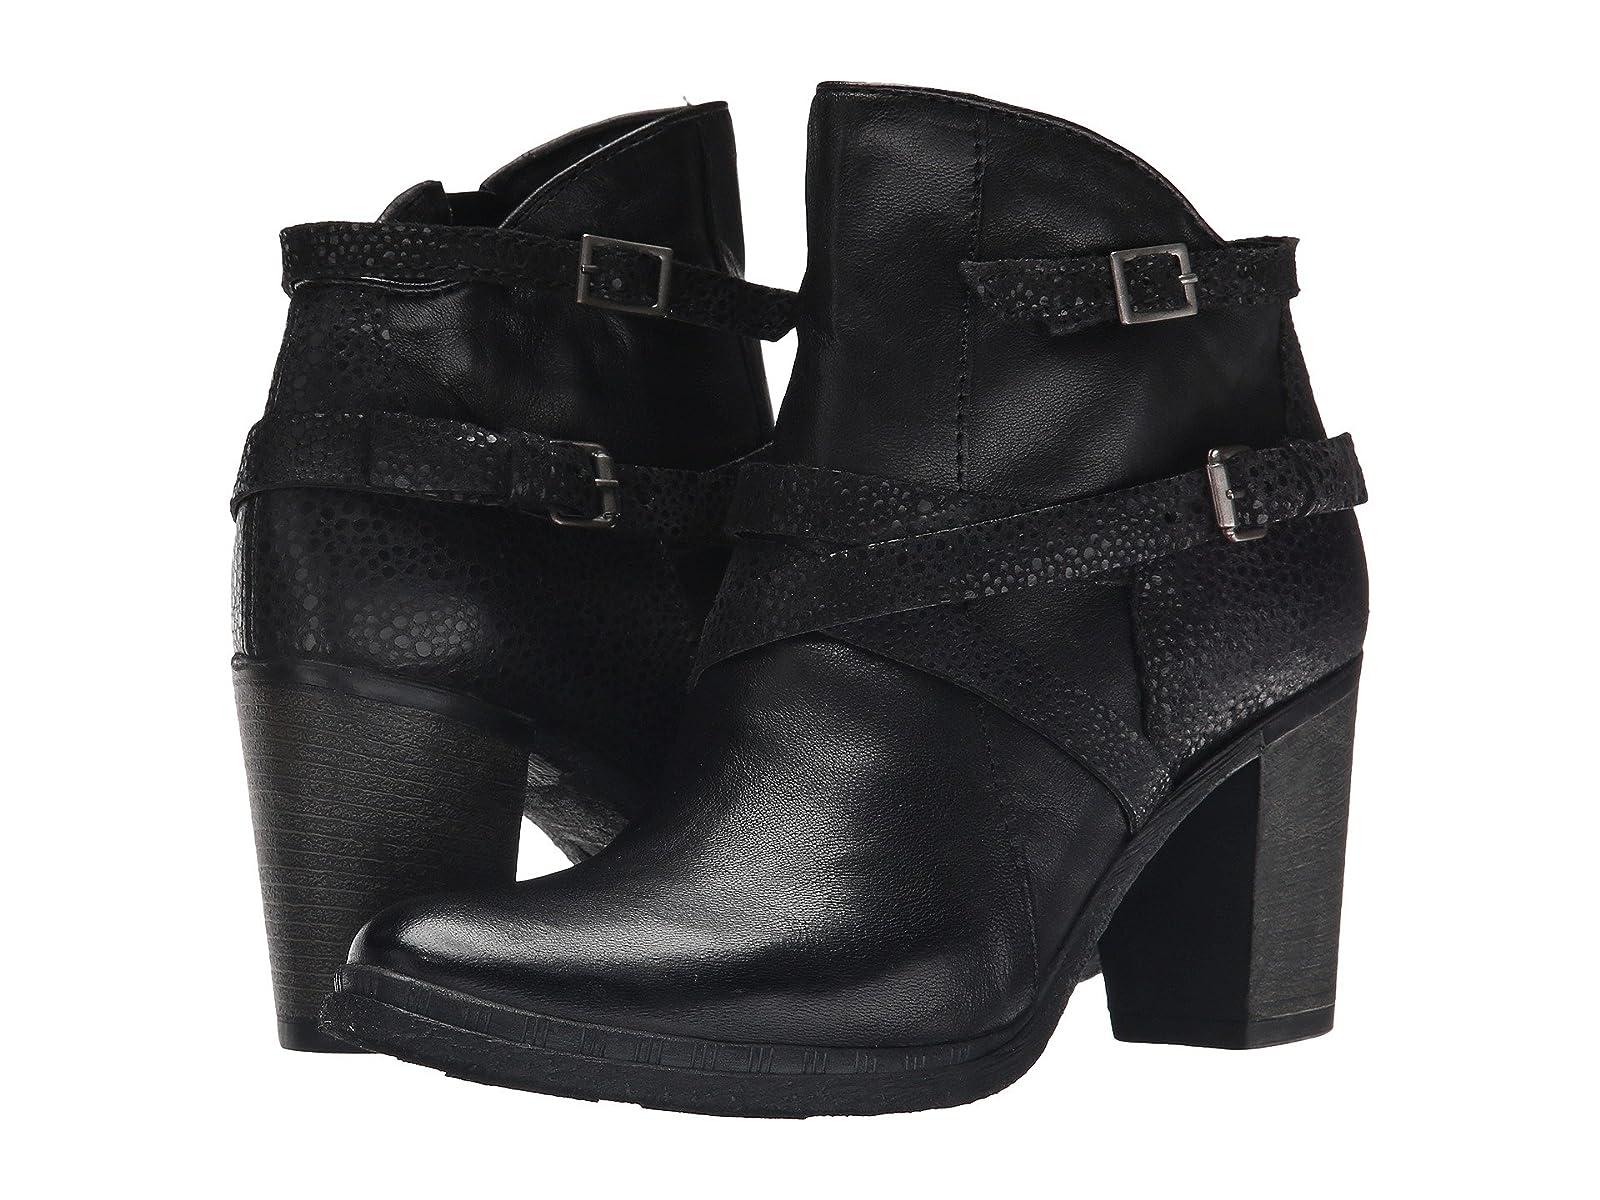 Miz Mooz RosanaCheap and distinctive eye-catching shoes